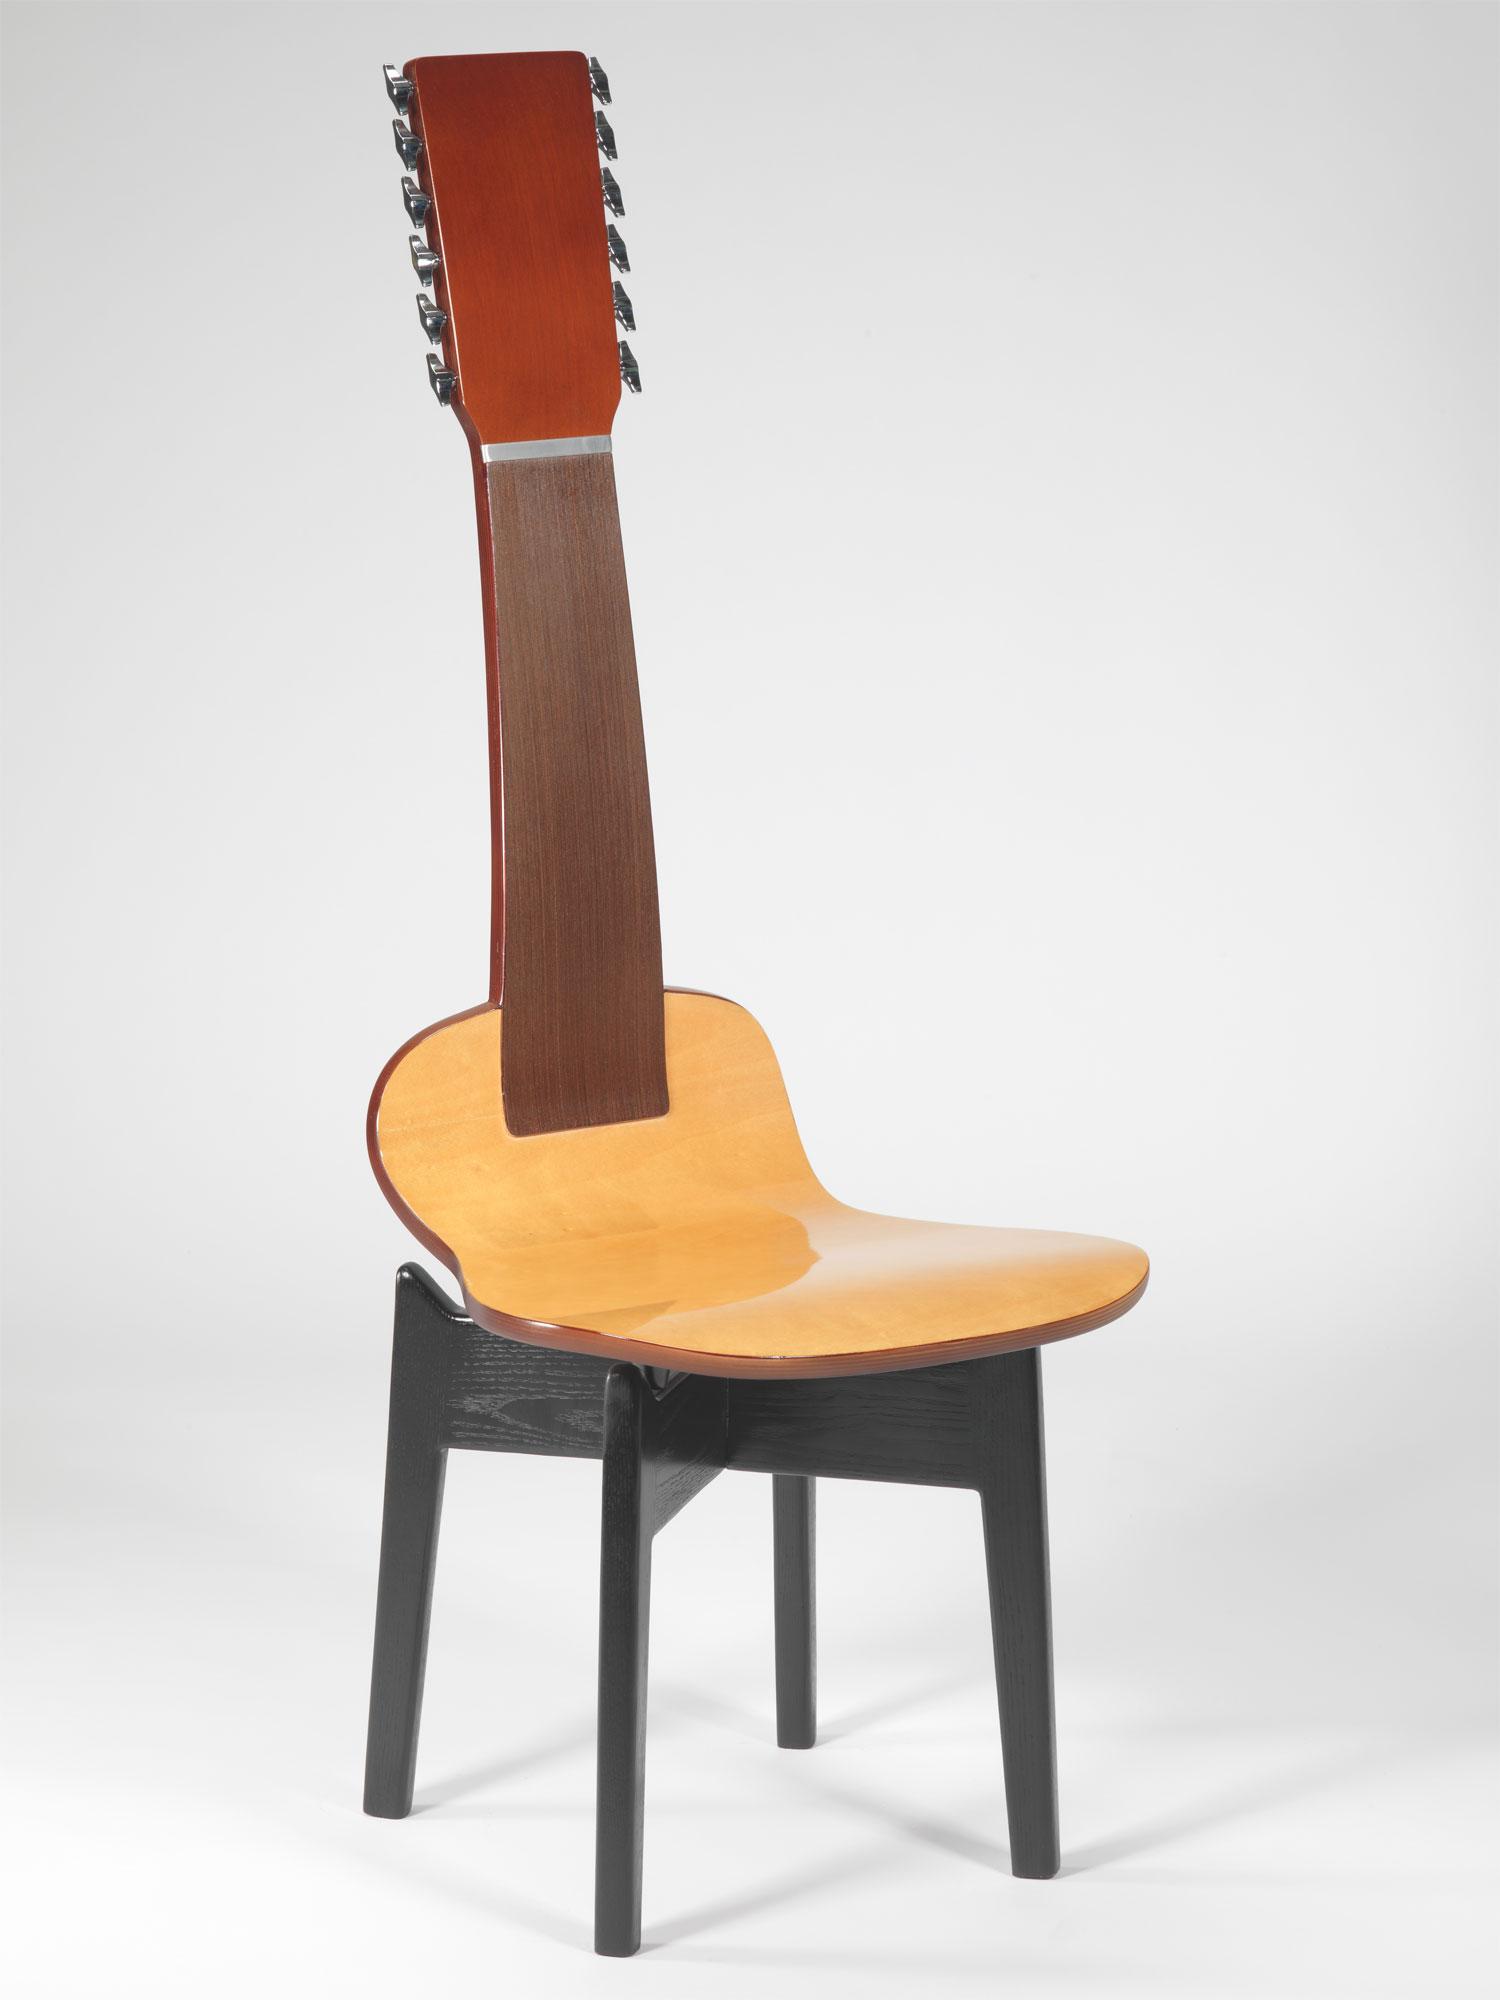 Twelve String Acoustic Model